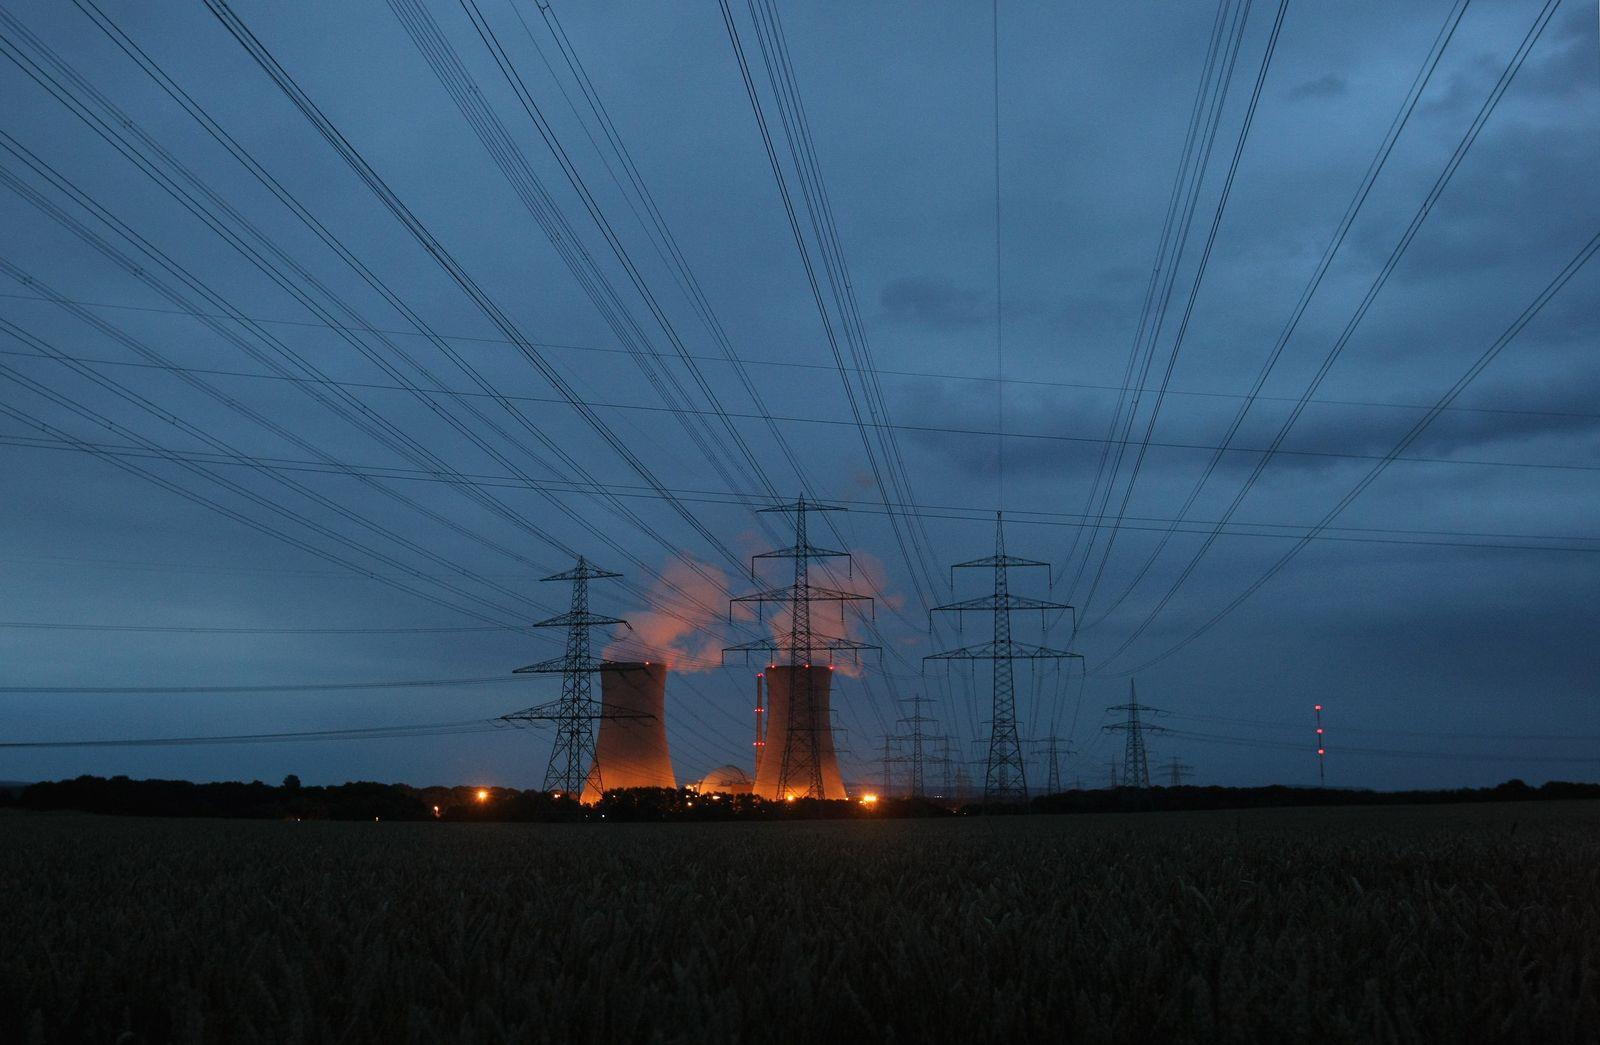 Atomkraftwerk Grafenrheinfeld E.on